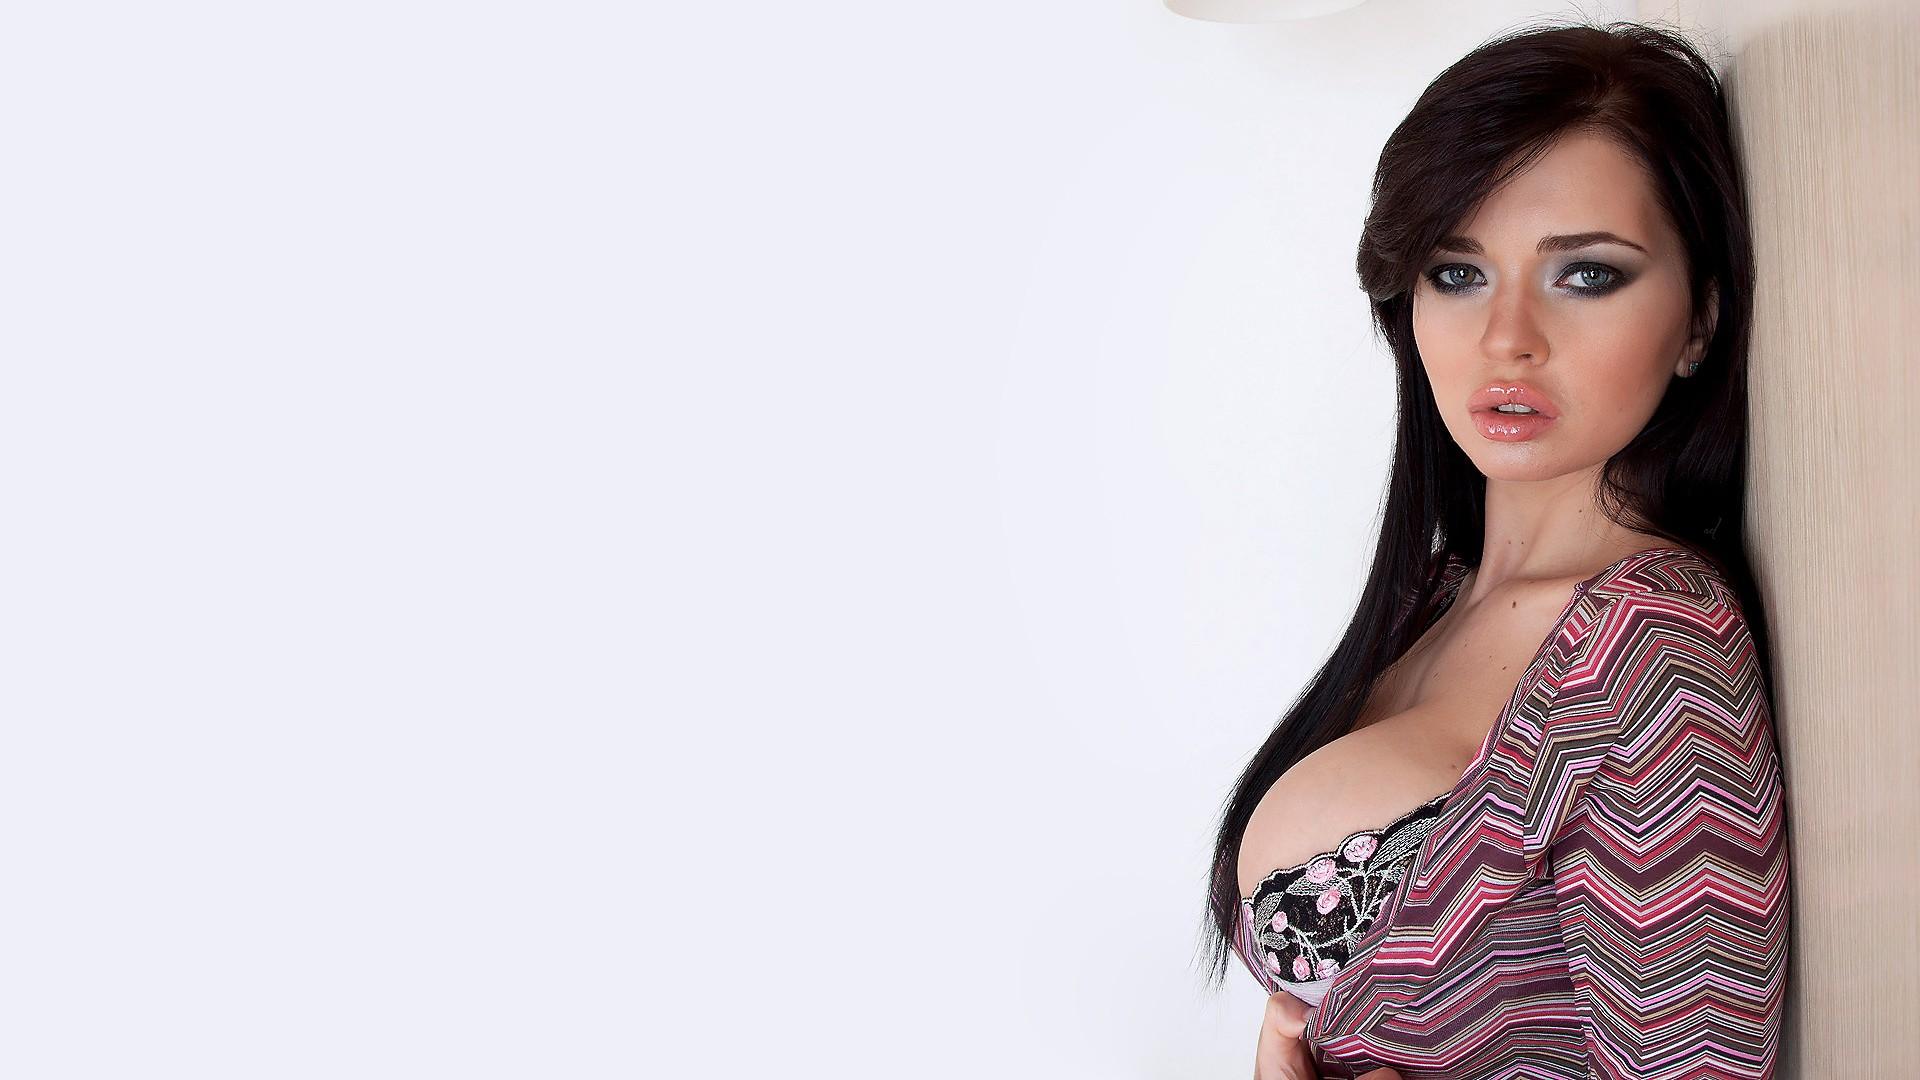 People 1920x1080 brunette simple background Ekaterina Sidorenko Sha Rizel pornstar